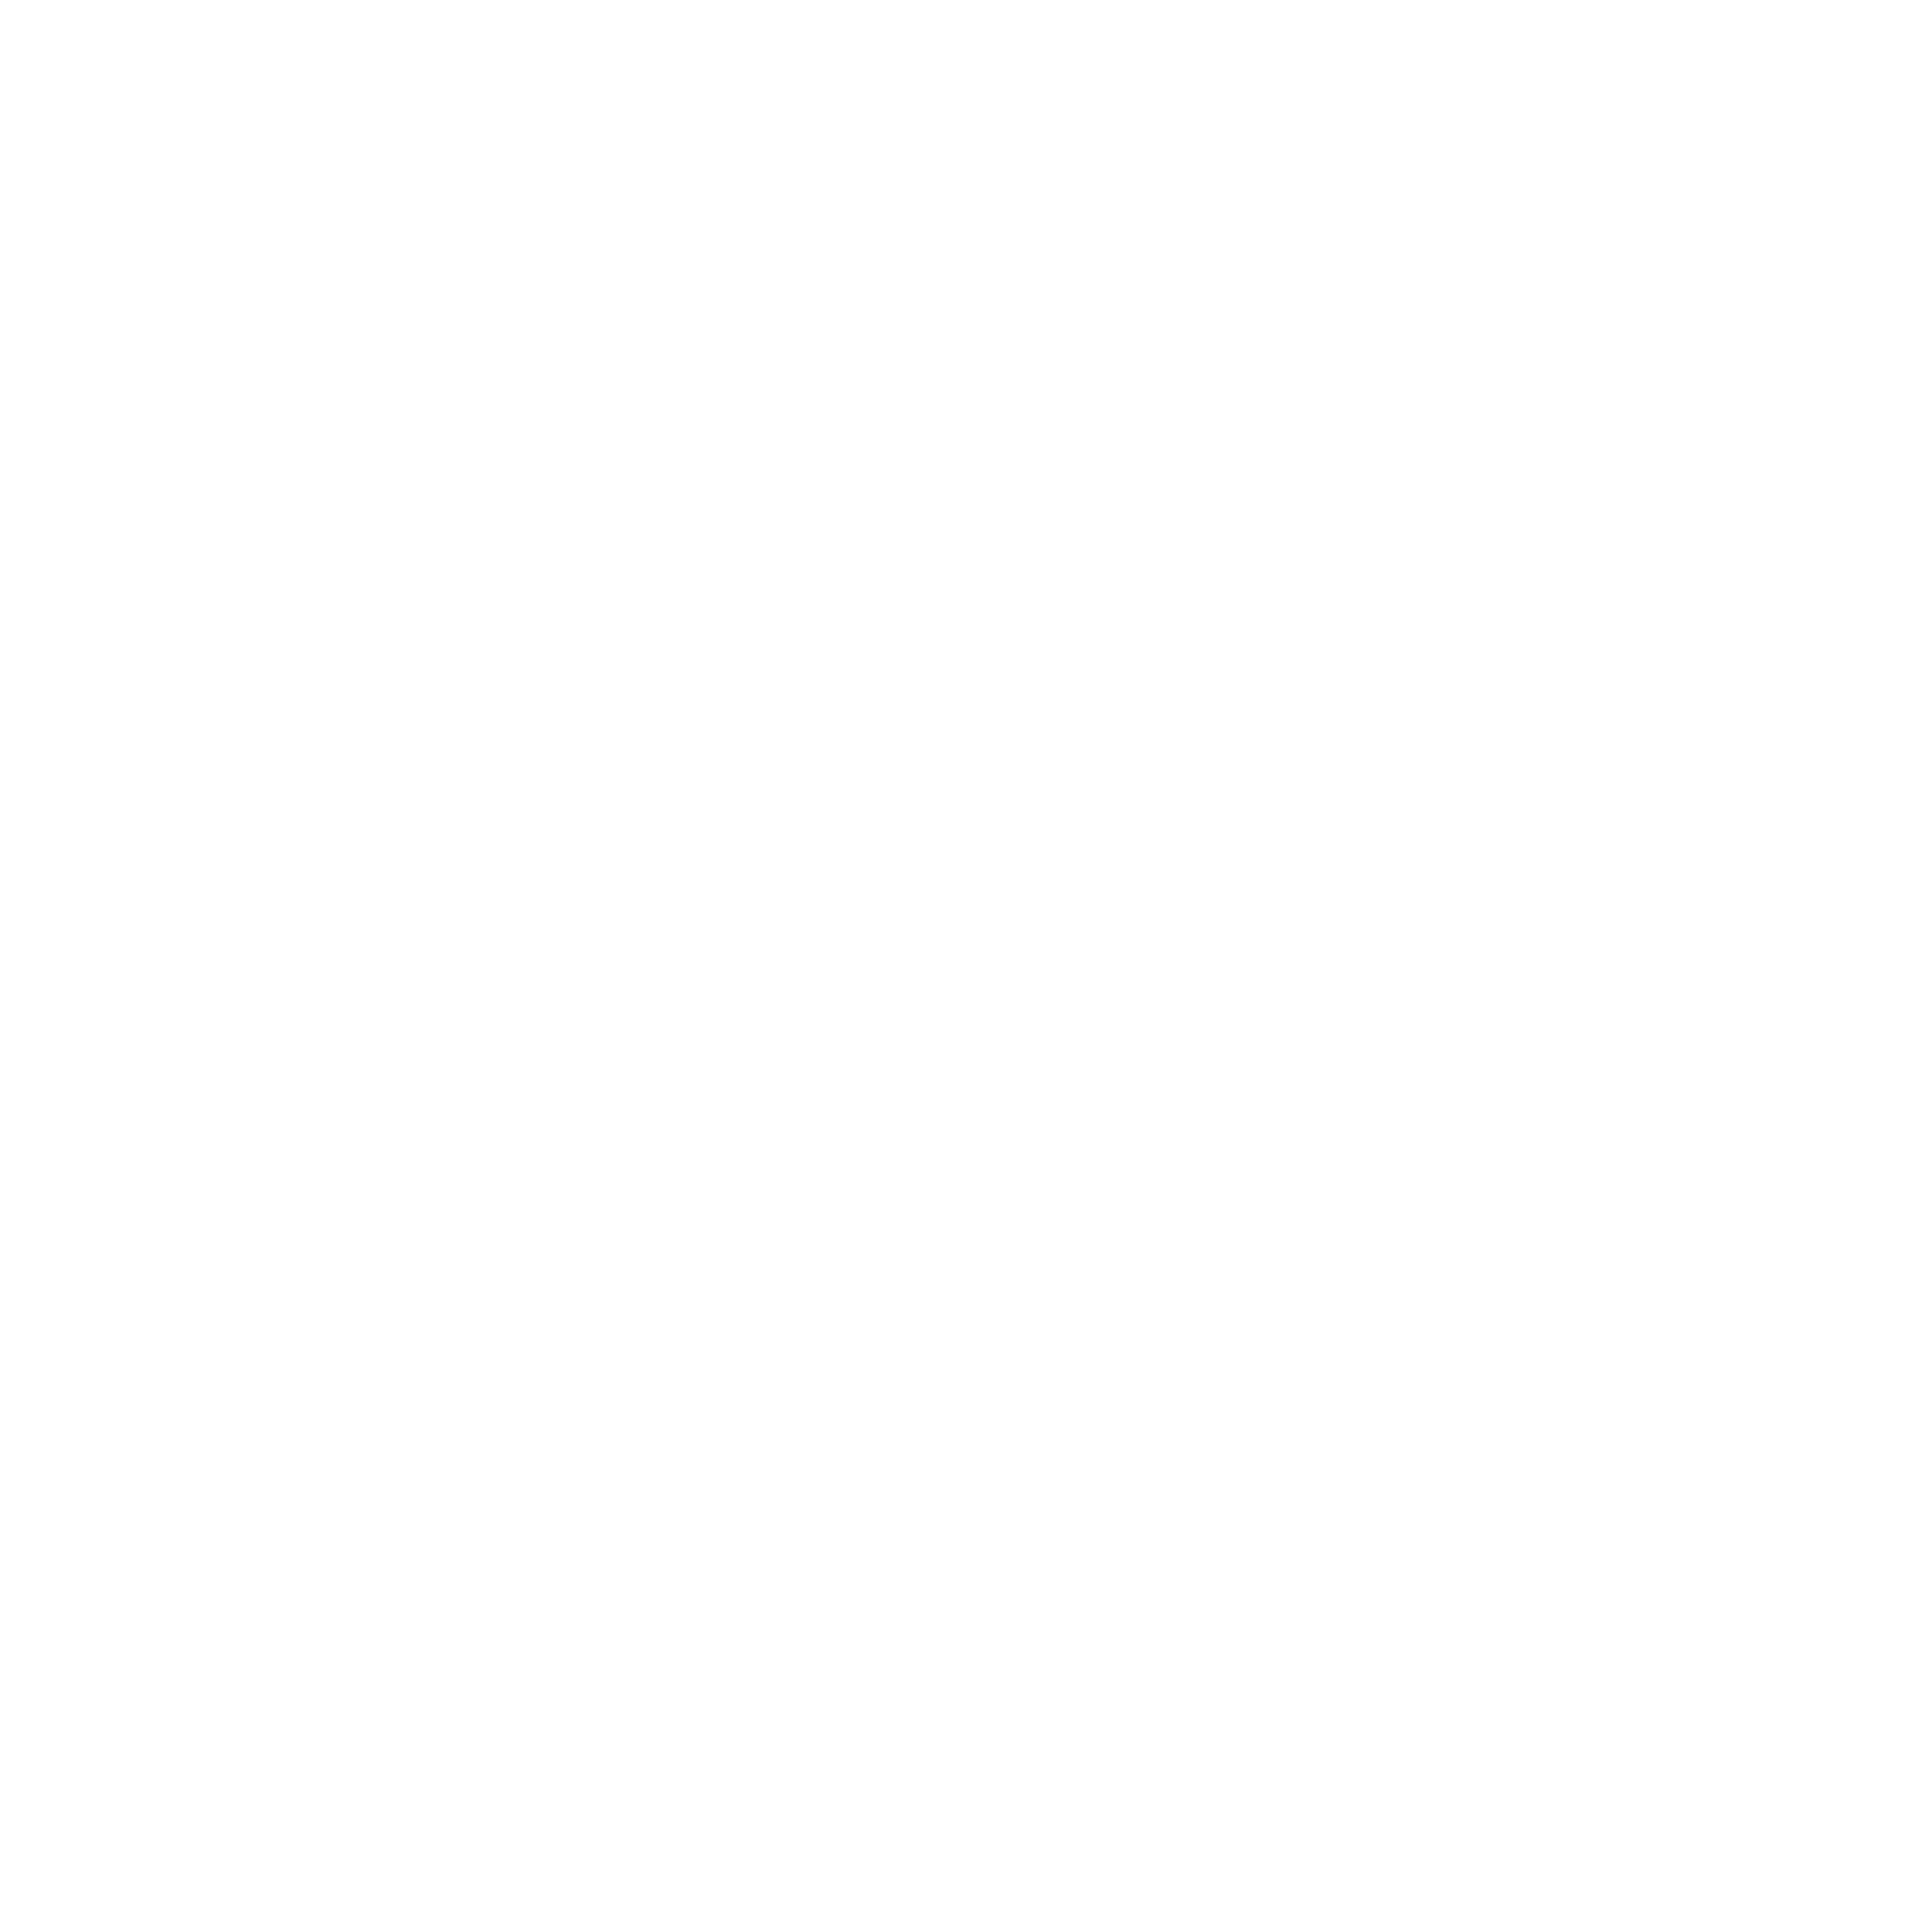 AOH campaign logo